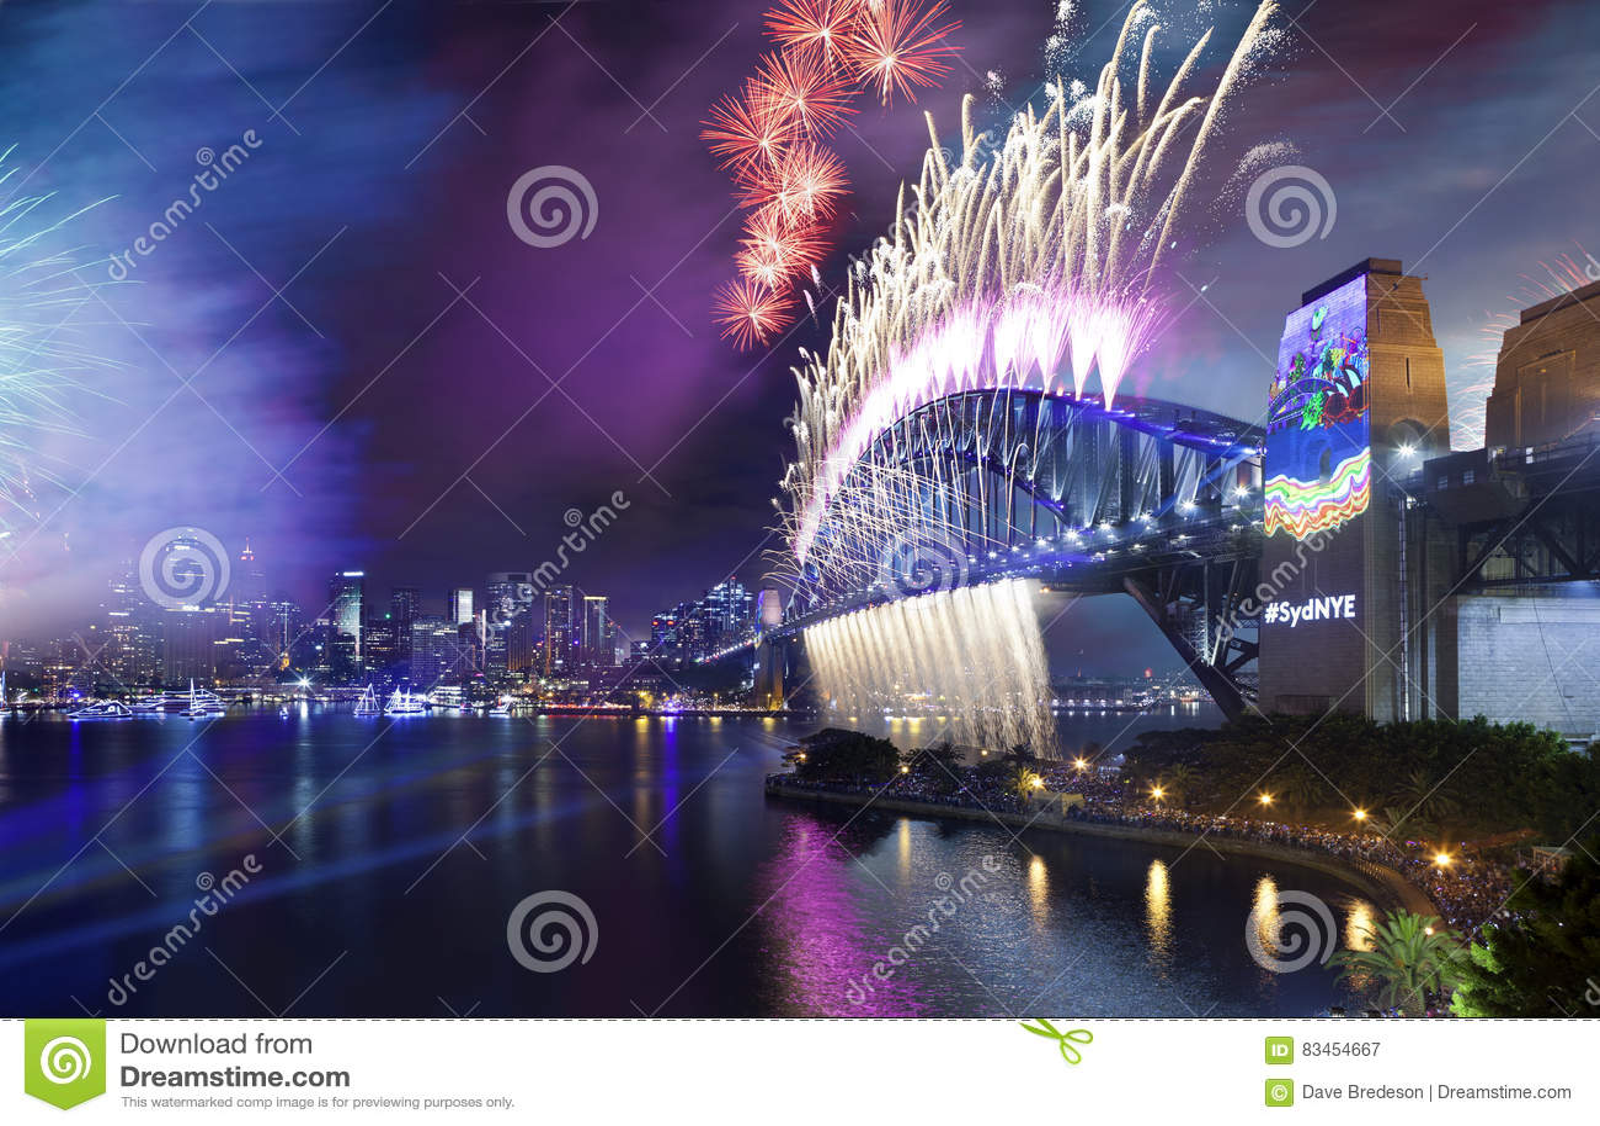 Download Fireworks Sydney Harbour Bridge Australia Stock Image - Image of landmarks, kirribilli: 83454667